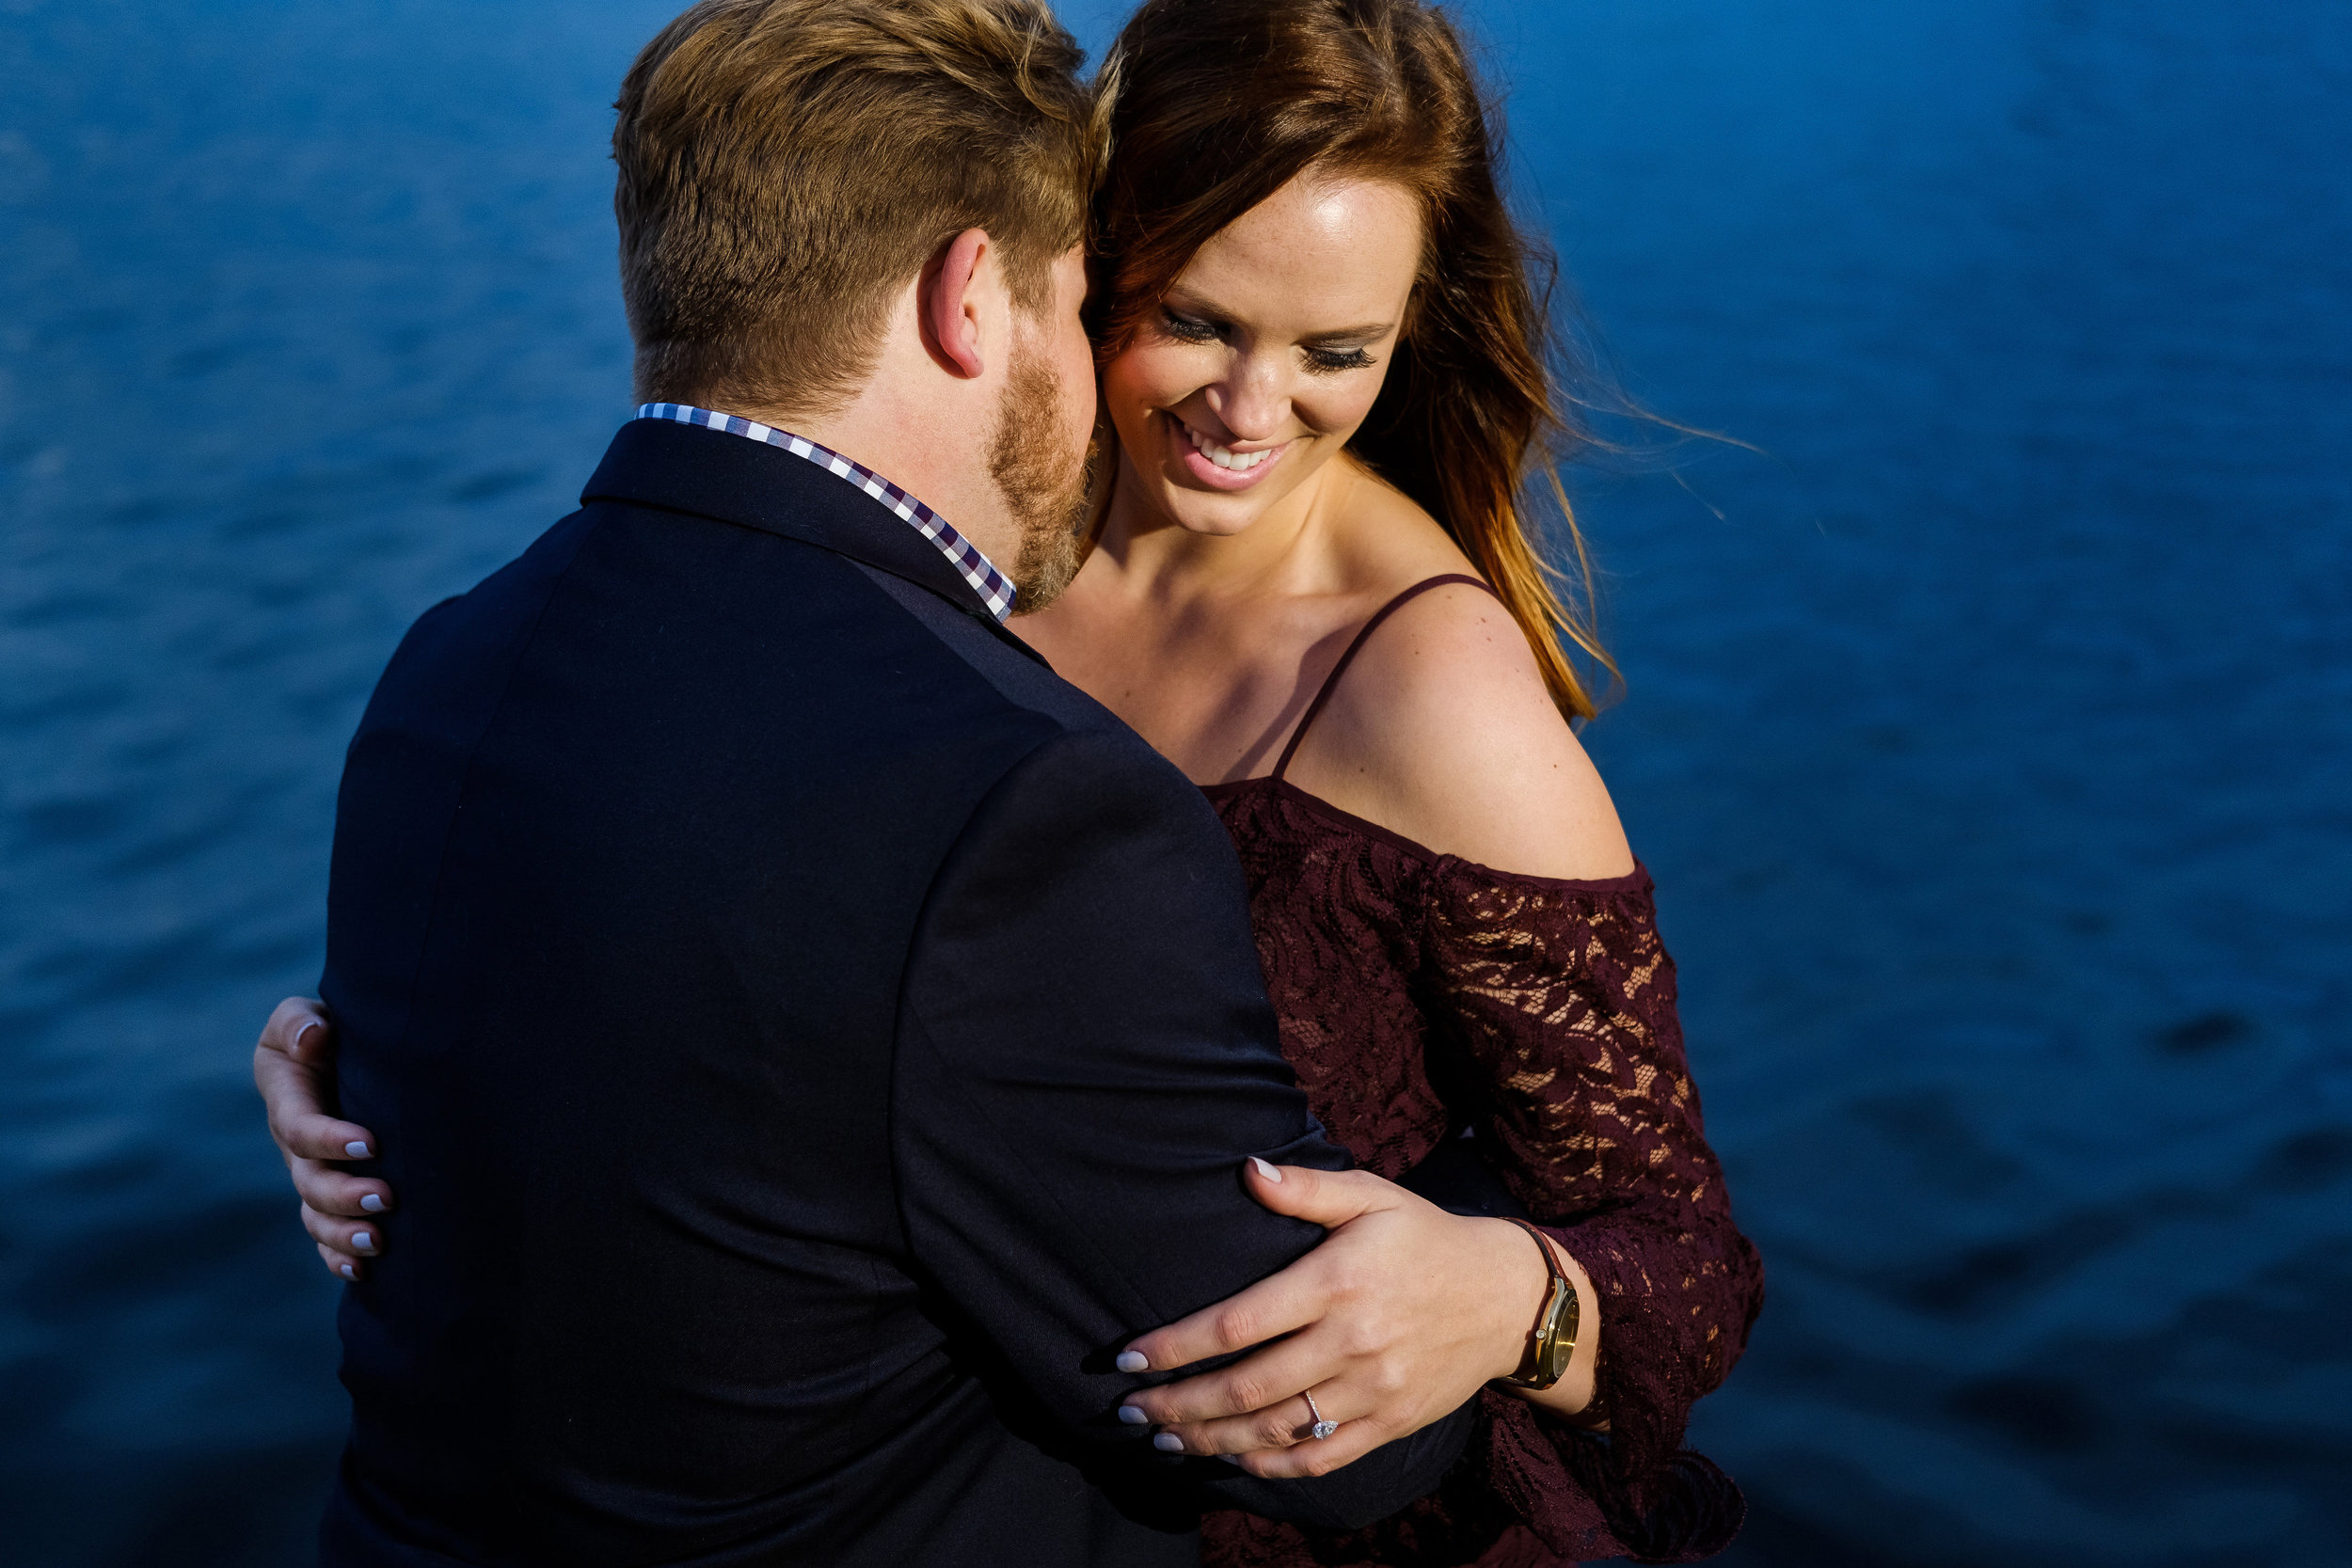 Engagement_Photographer_ChadWinstead.jpg